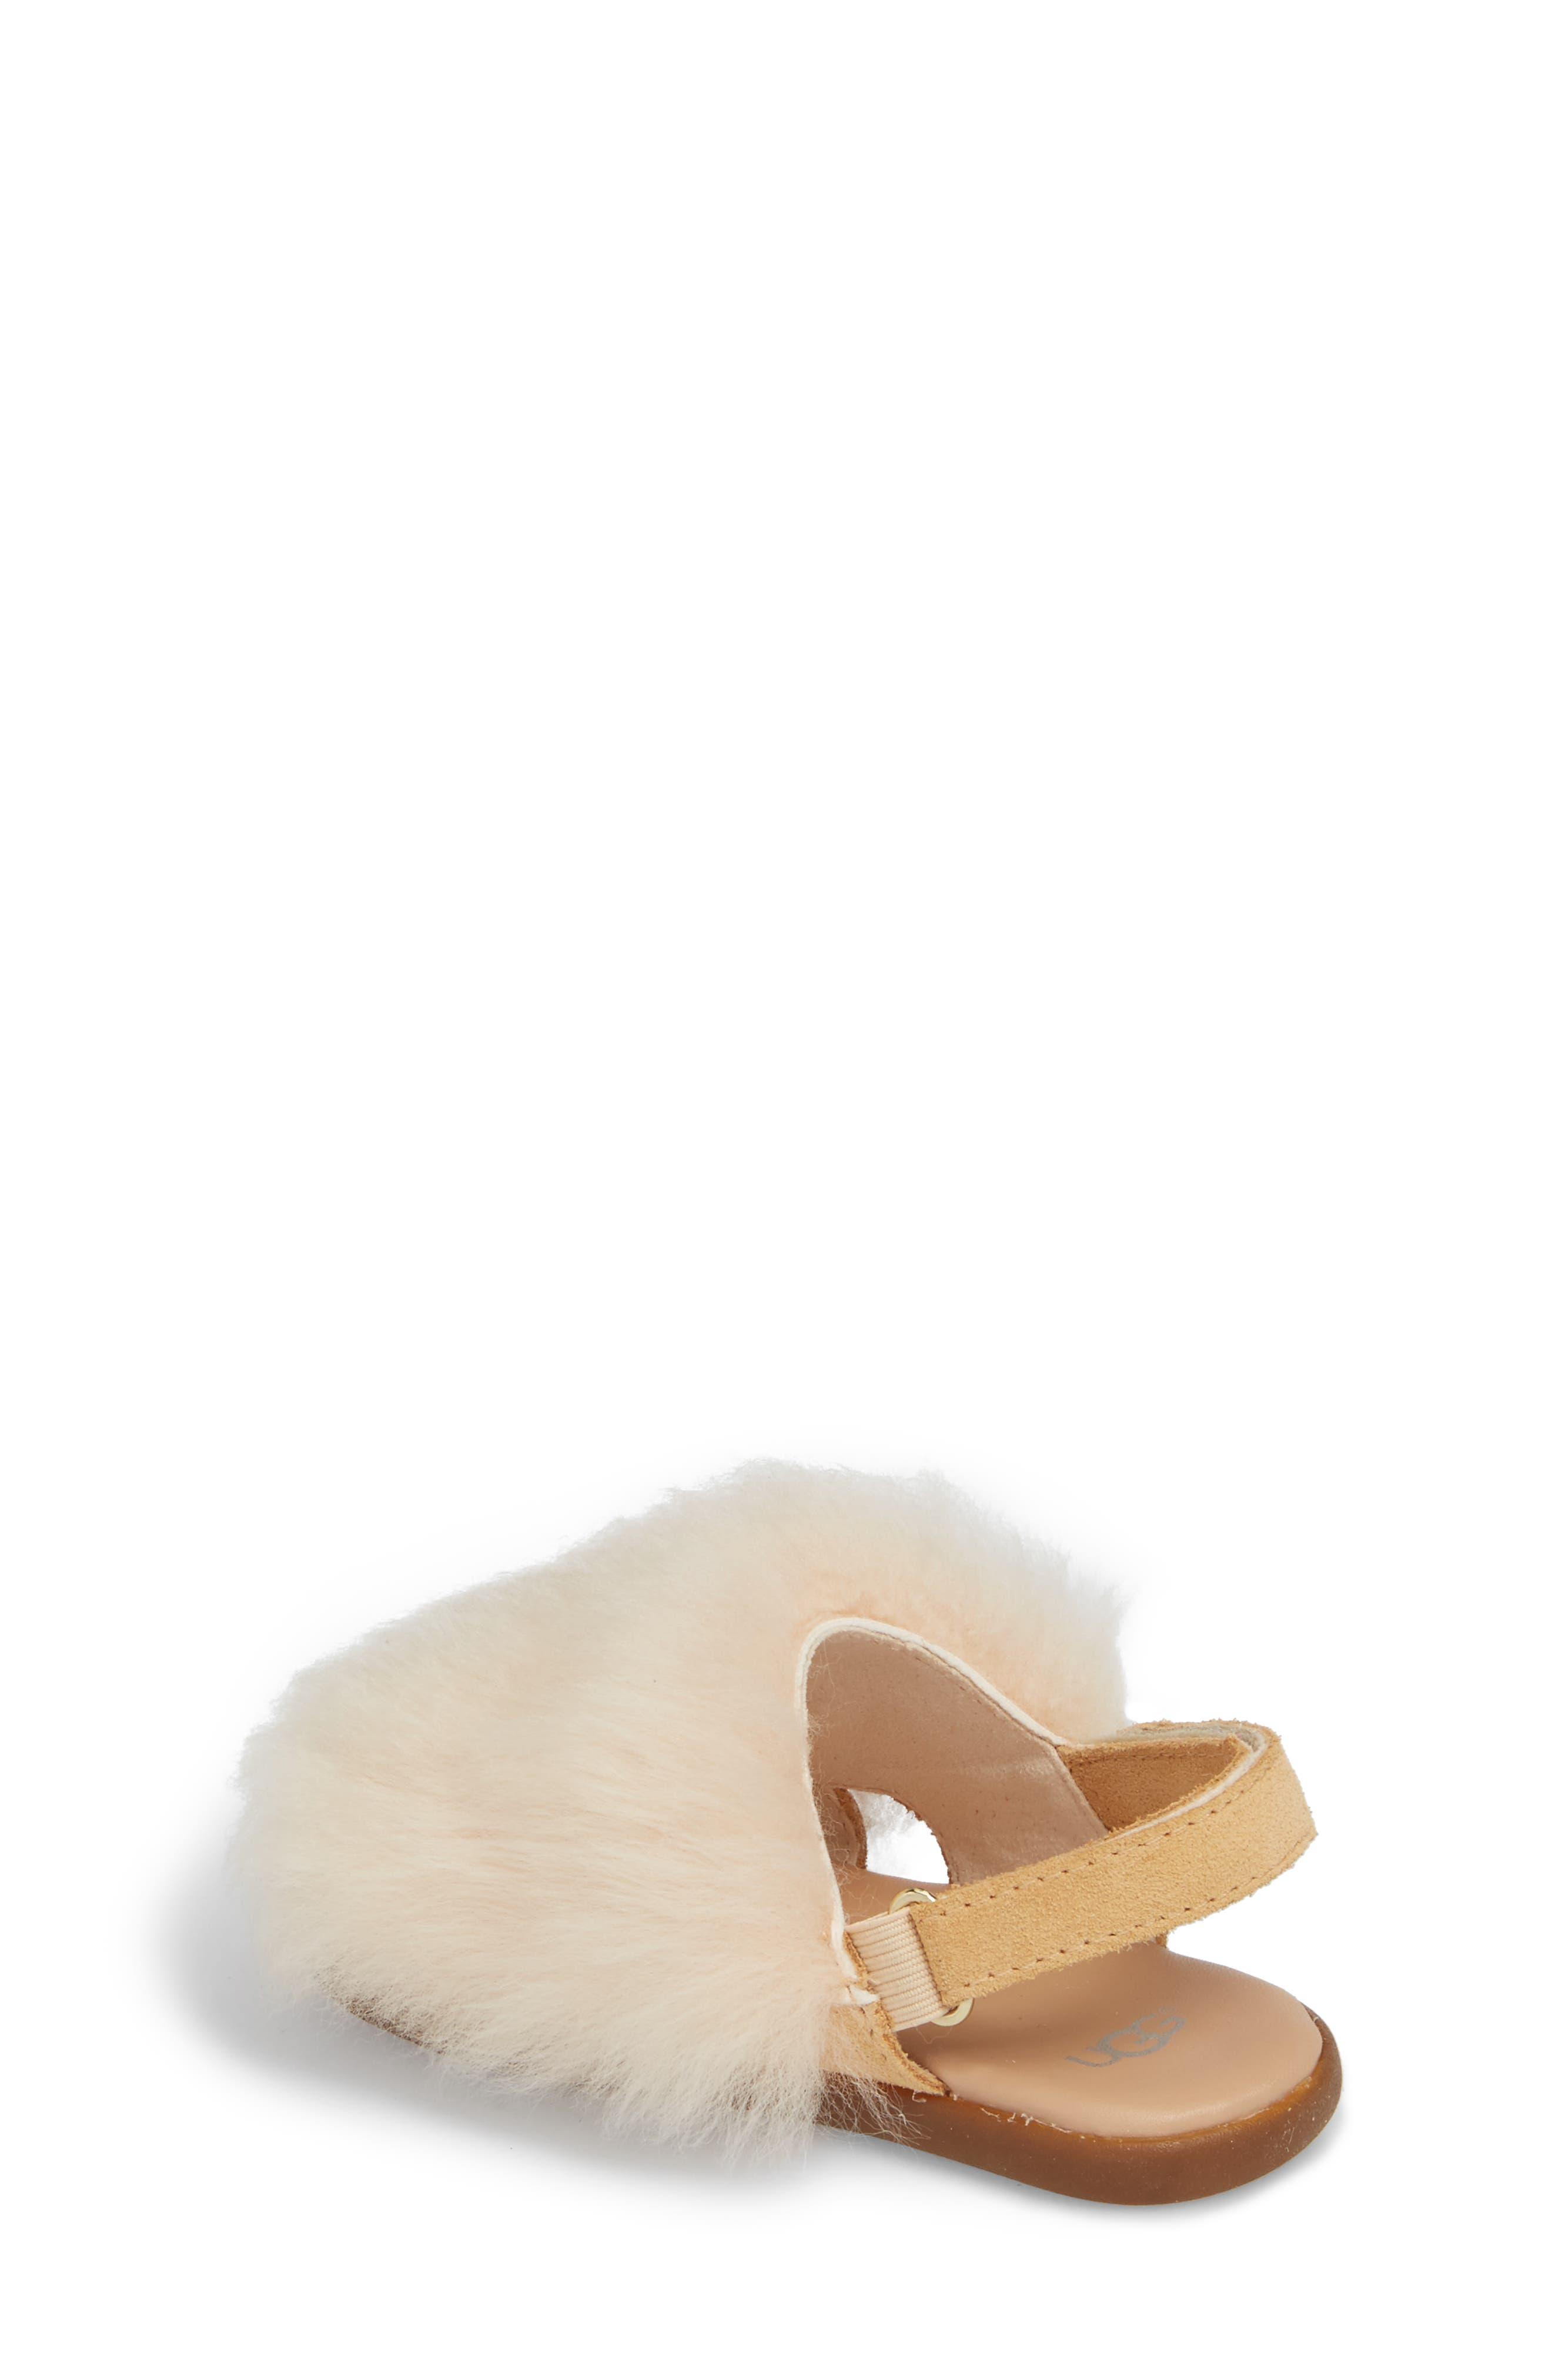 Holly Genuine Shearling Sandal,                             Alternate thumbnail 2, color,                             Soft Ochre